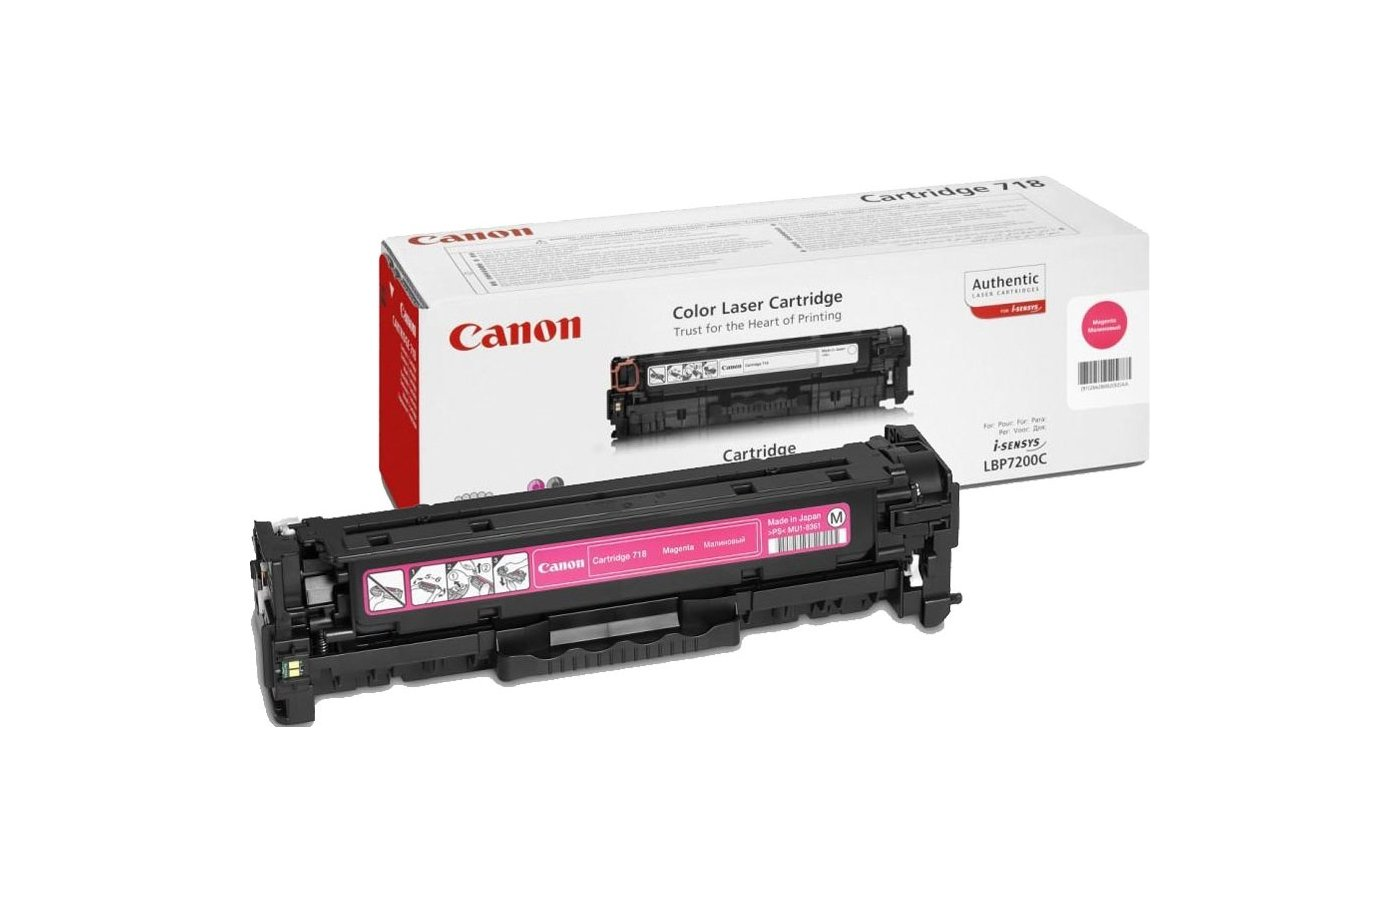 Картридж лазерный Canon 718 пурпурный для LBP7200Cdn/MF8330Cdn/MF8350Cn (2660B002)